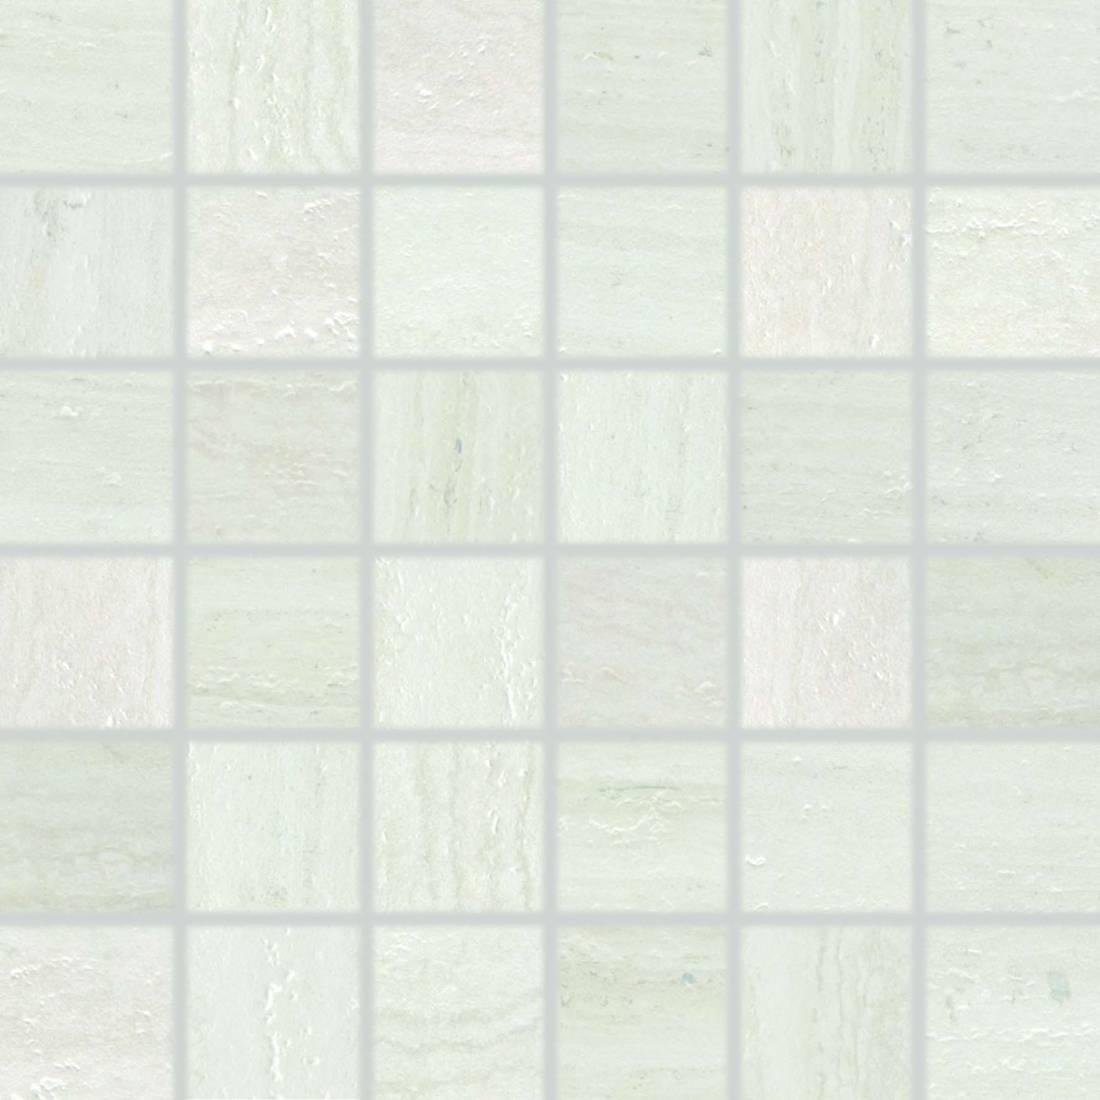 Alba Square 30x30 Ivory 1